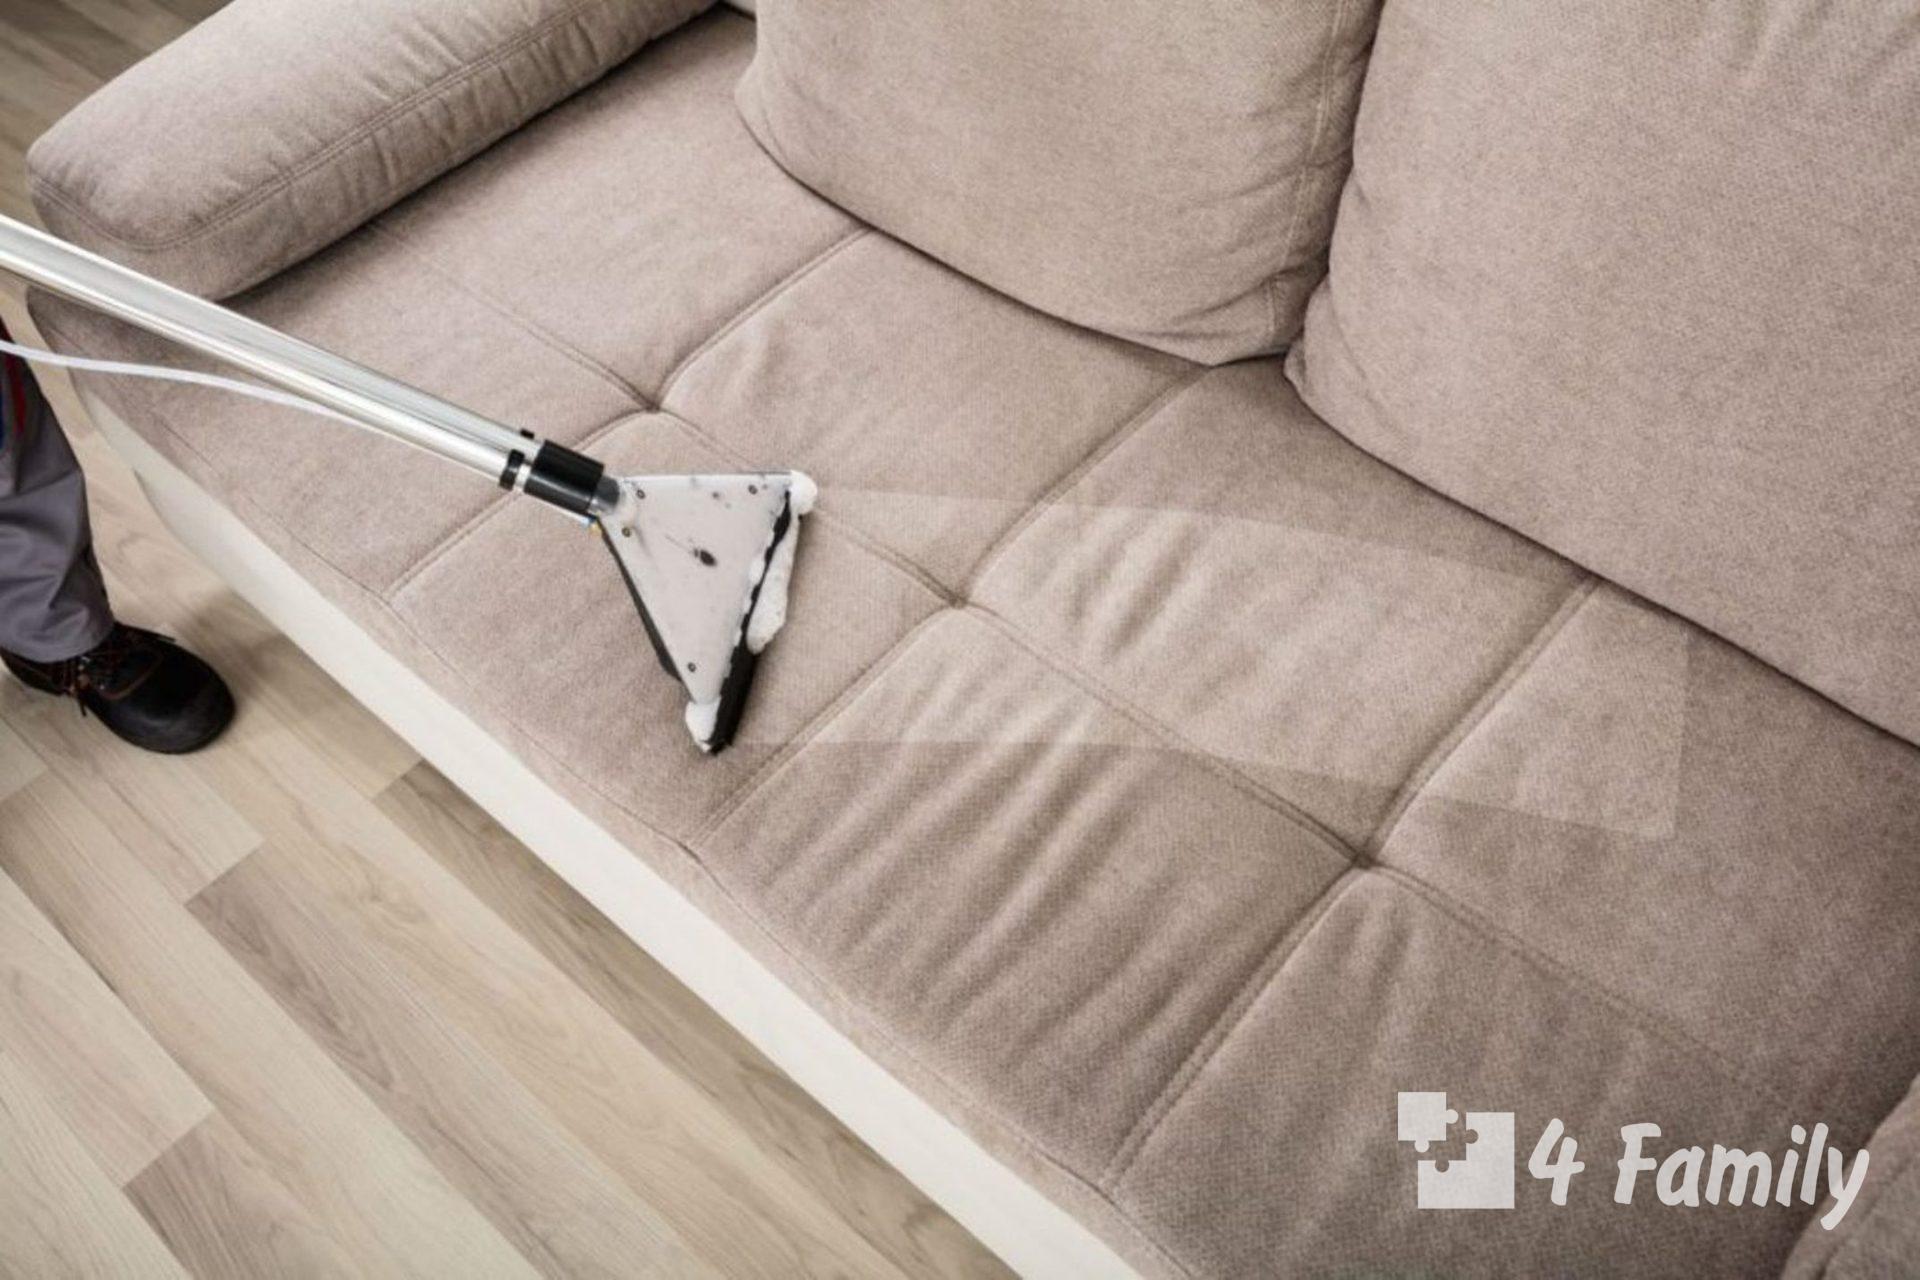 Фото. Как почистить диван от грязи и запаха в домашних условиях